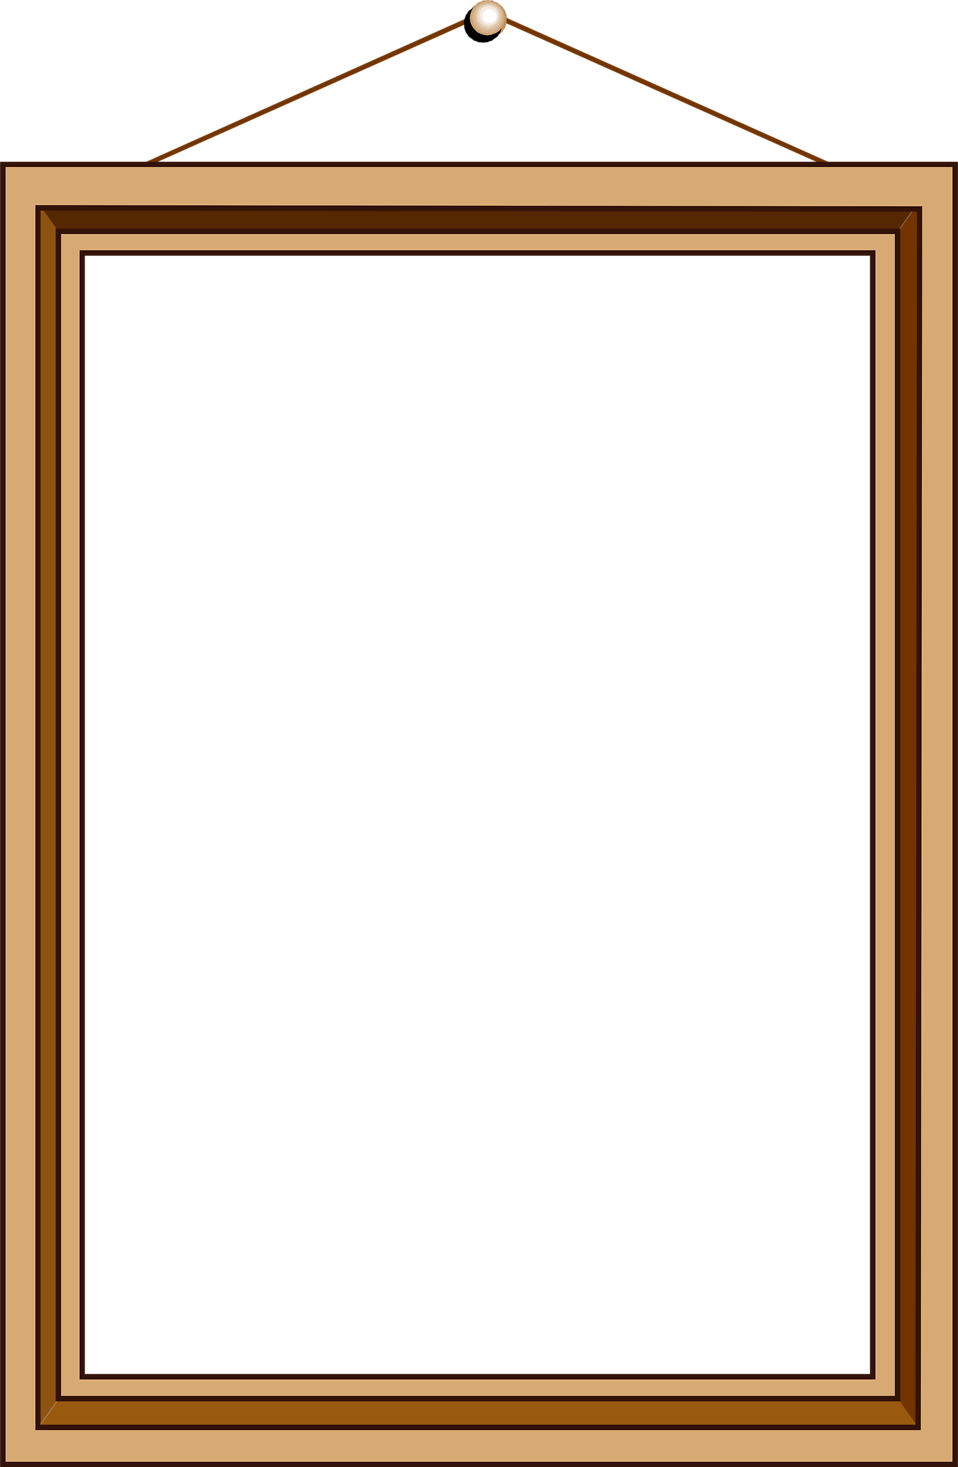 Blank Picture Frame Wallpaper - WallpaperSafari